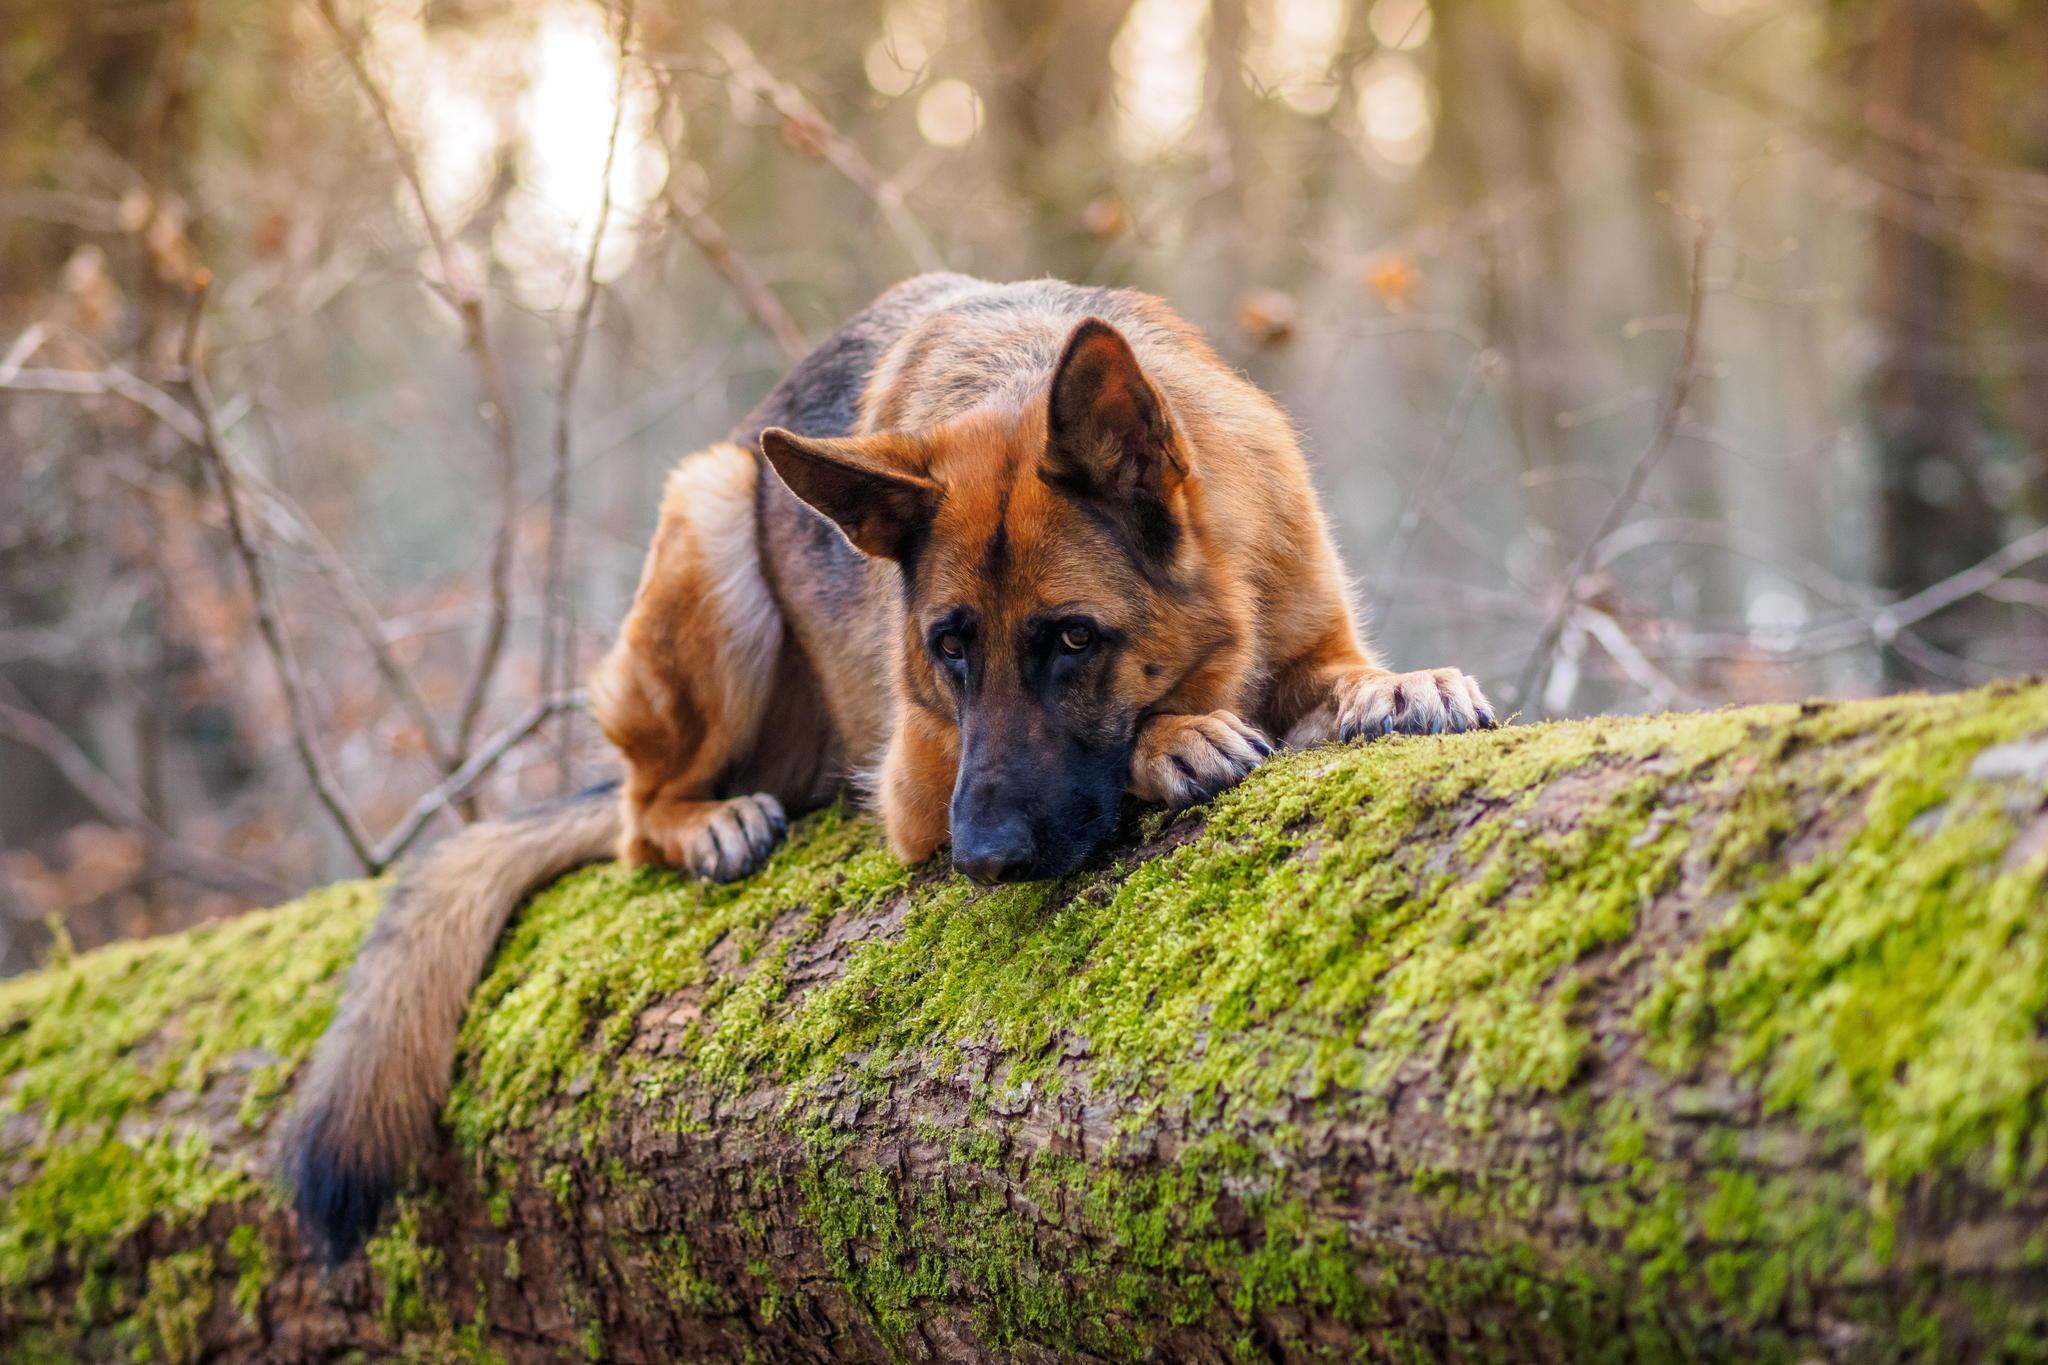 природа животные собака немецка овчарка nature animals dog the German shepherd  № 1004464 загрузить